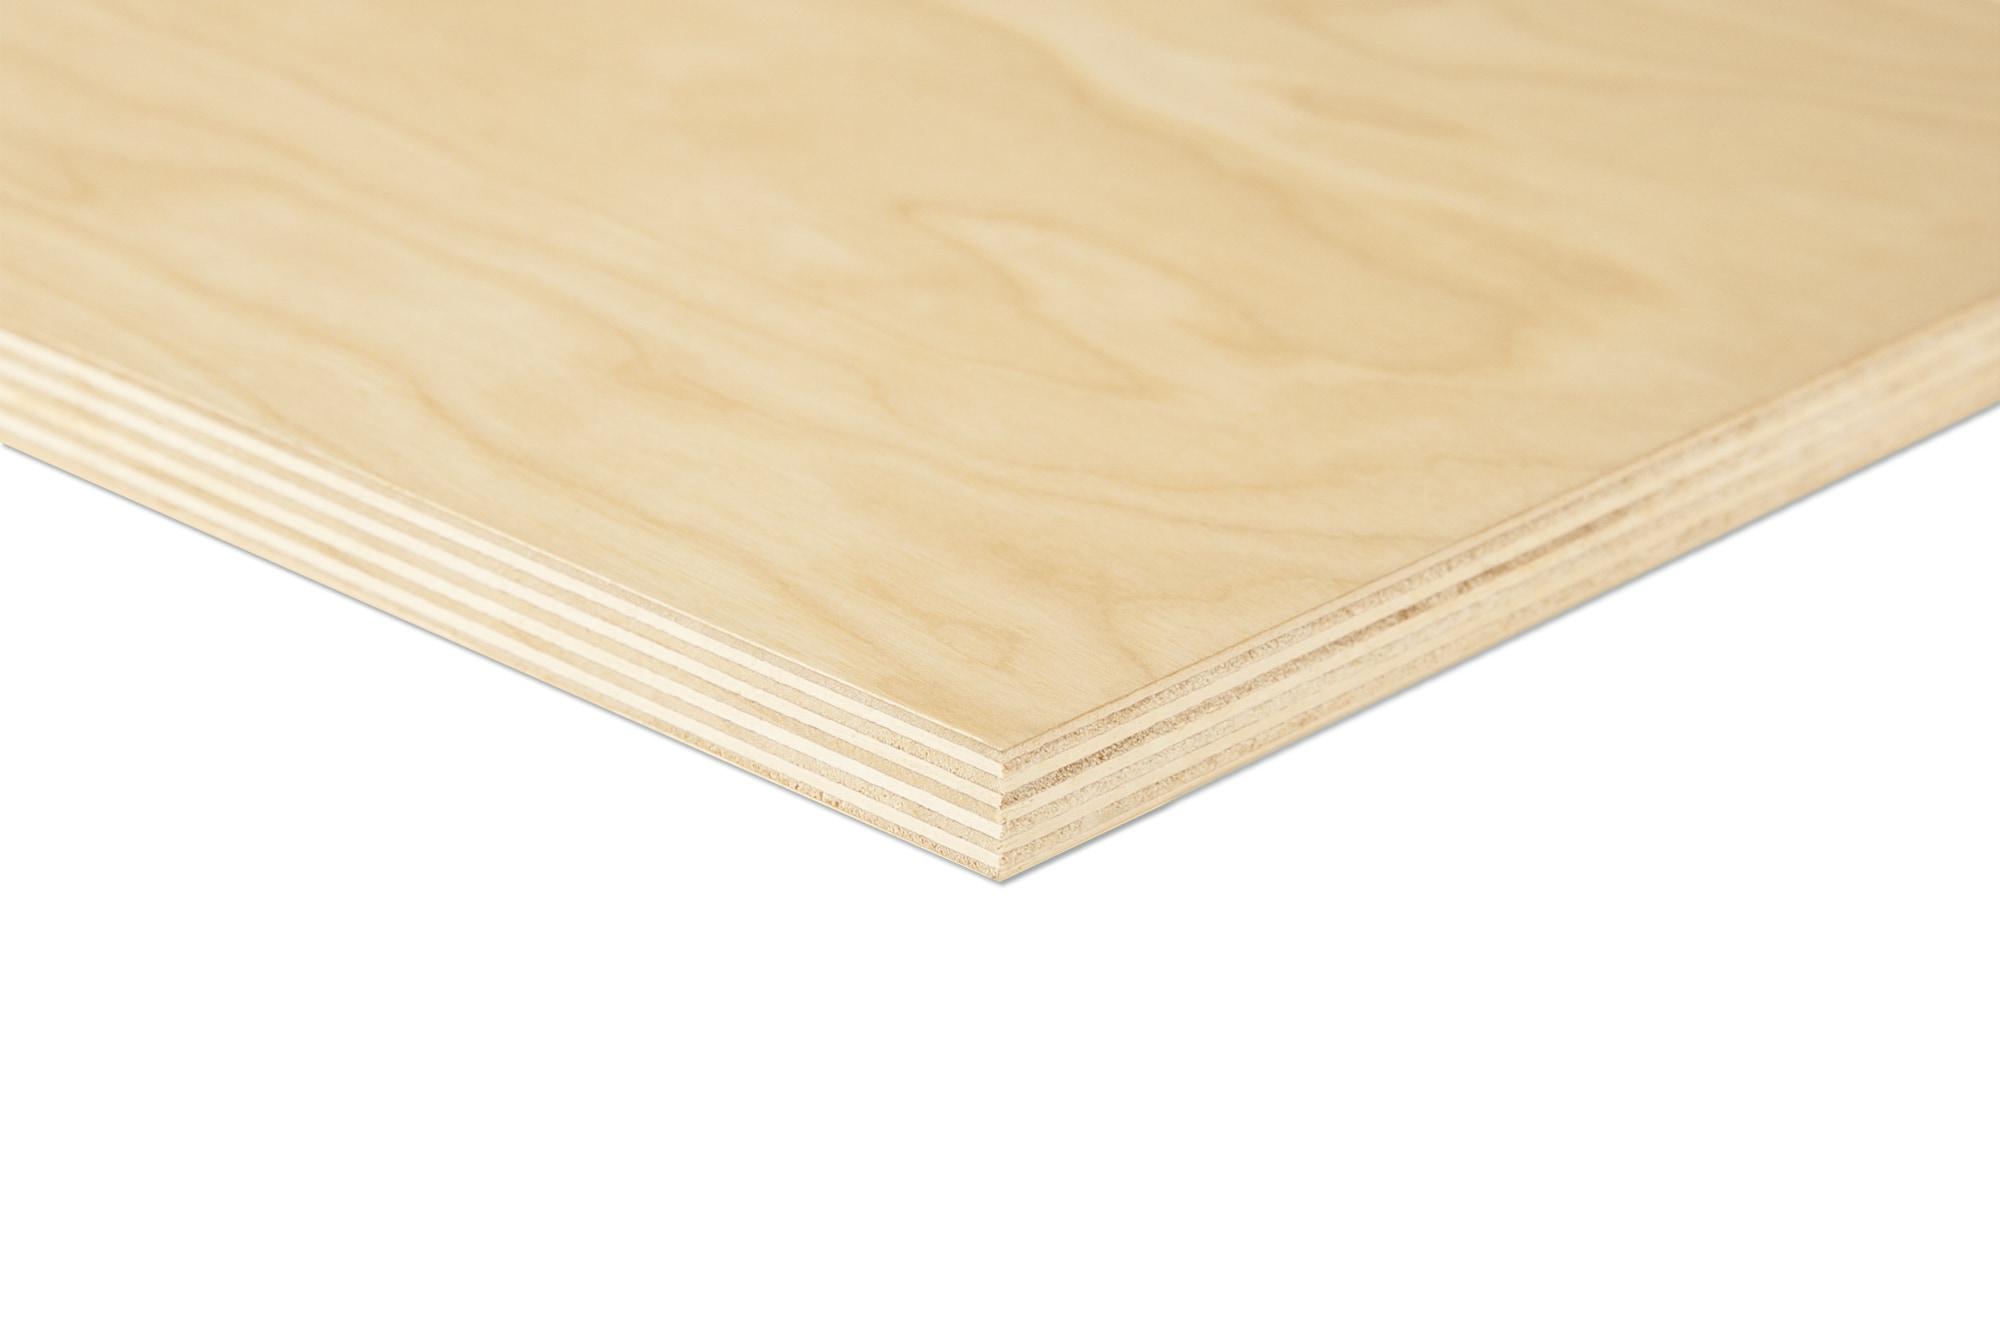 Sanply Prefinished Birch Plywood C D Grade 1 2 75 Sheet Pack